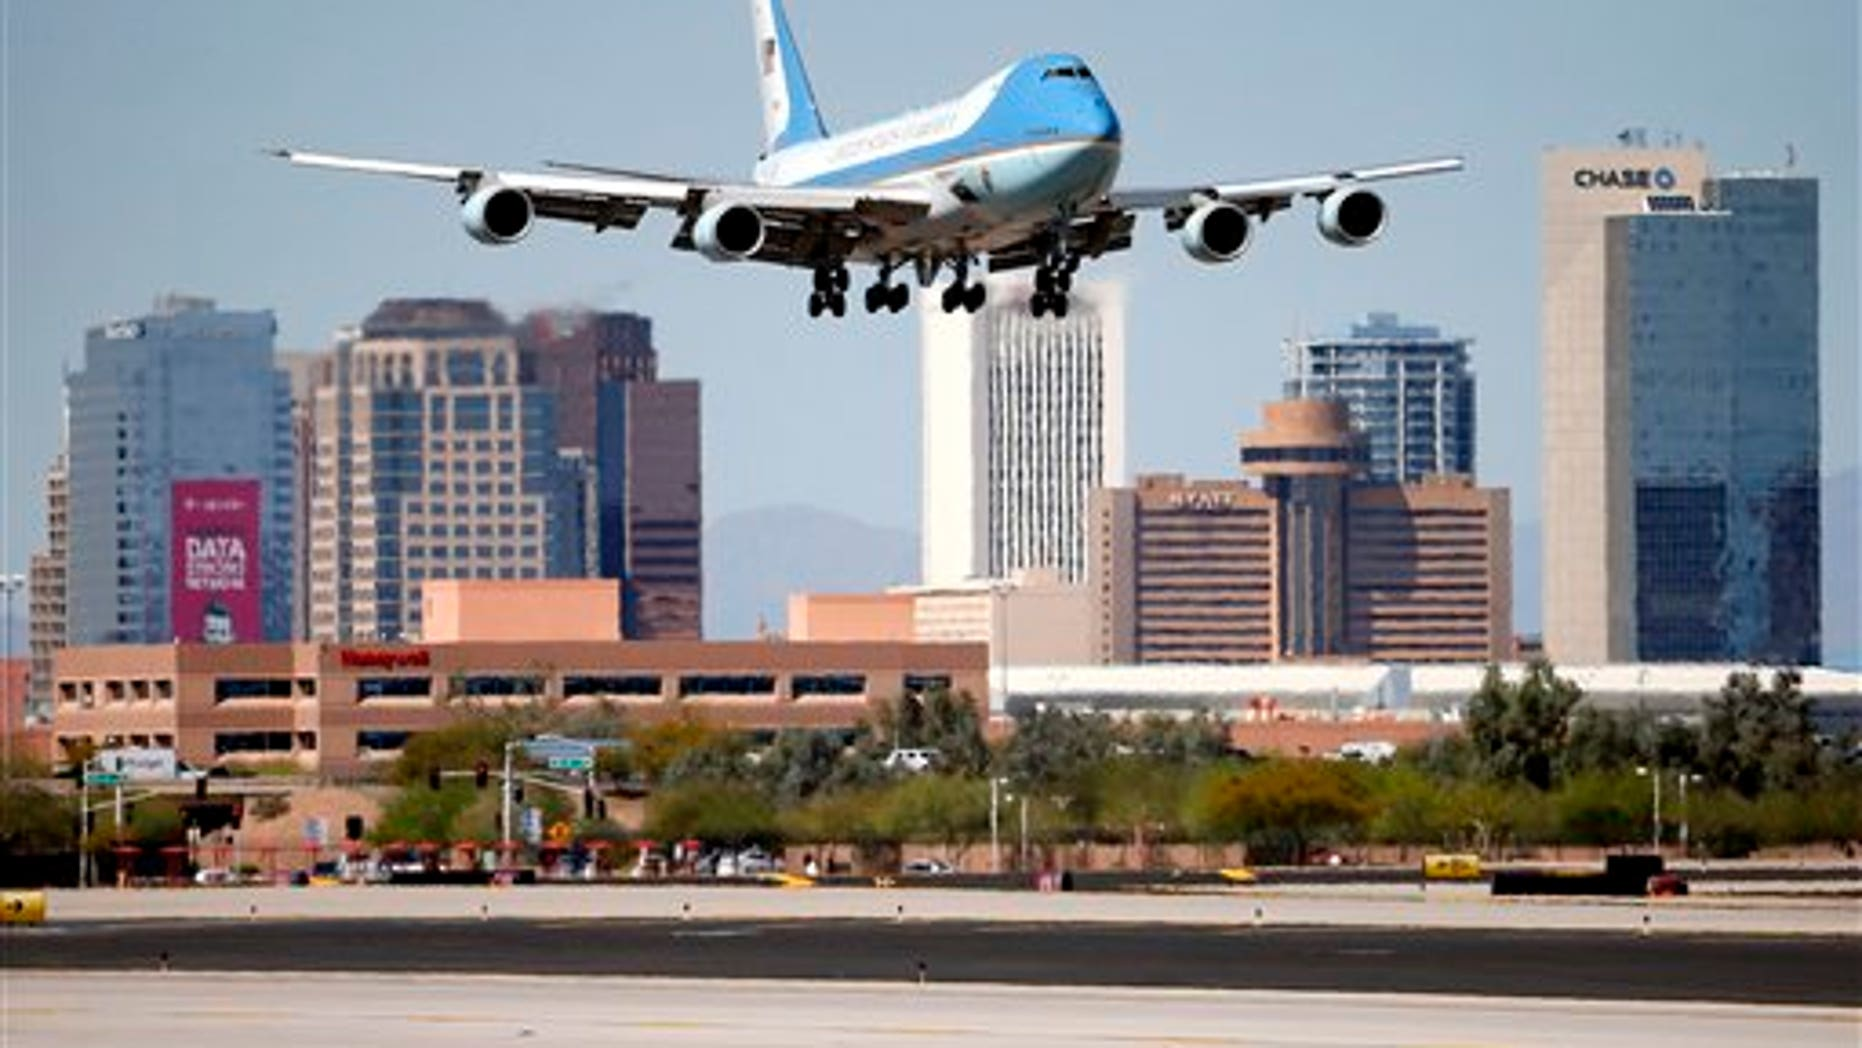 Air Force One arrives at Sky Harbor International Airport, Friday, March 13, 2015, in Phoenix. (AP Photo/Matt York)